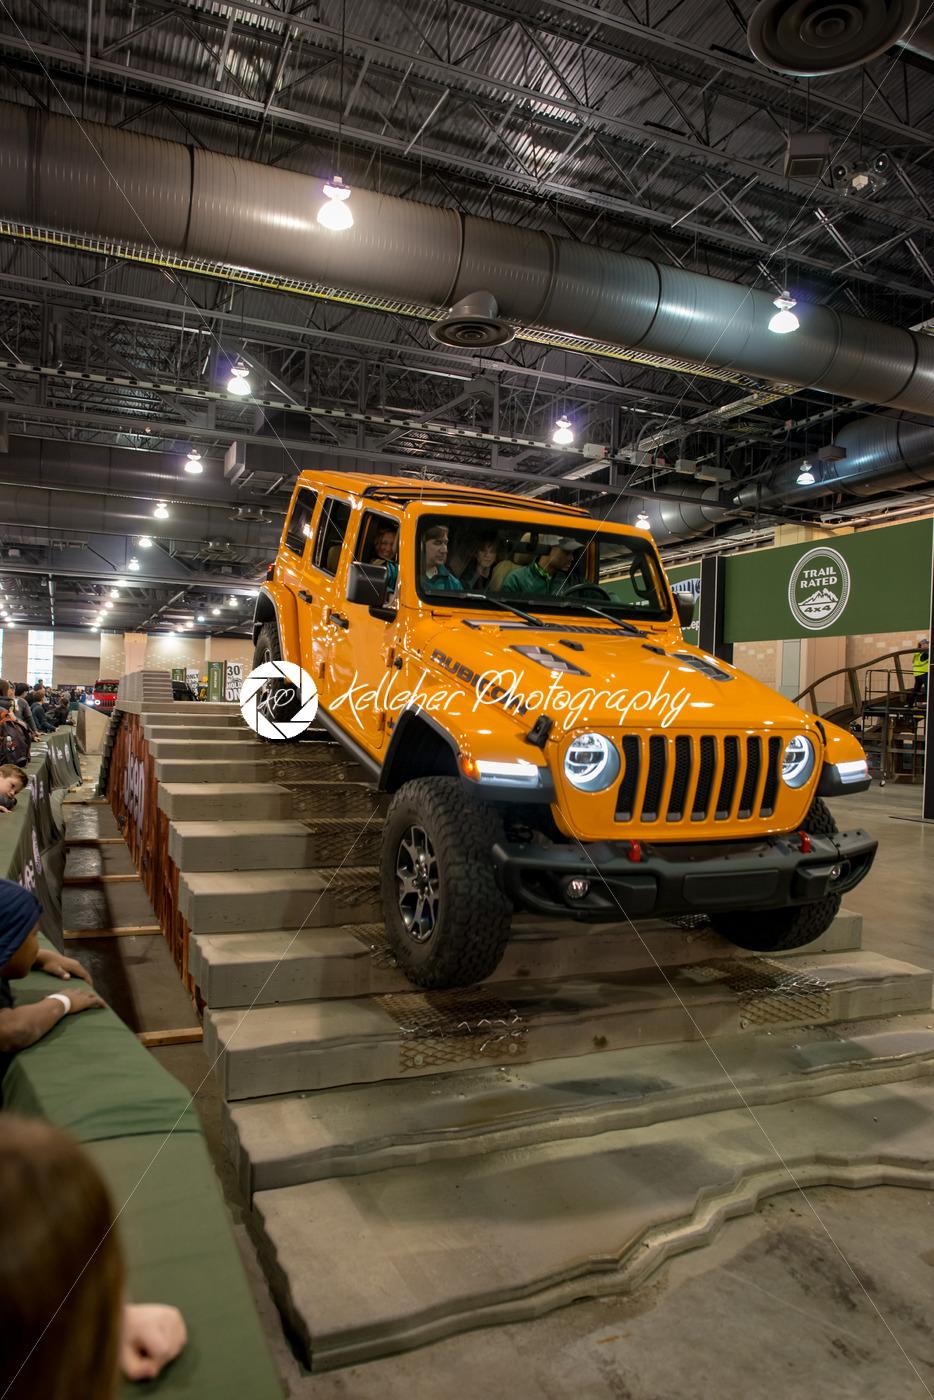 PHILADELPHIA, PA – Feb 3: Jeep at the 2018 Philadelphia Auto Show - Kelleher Photography Store